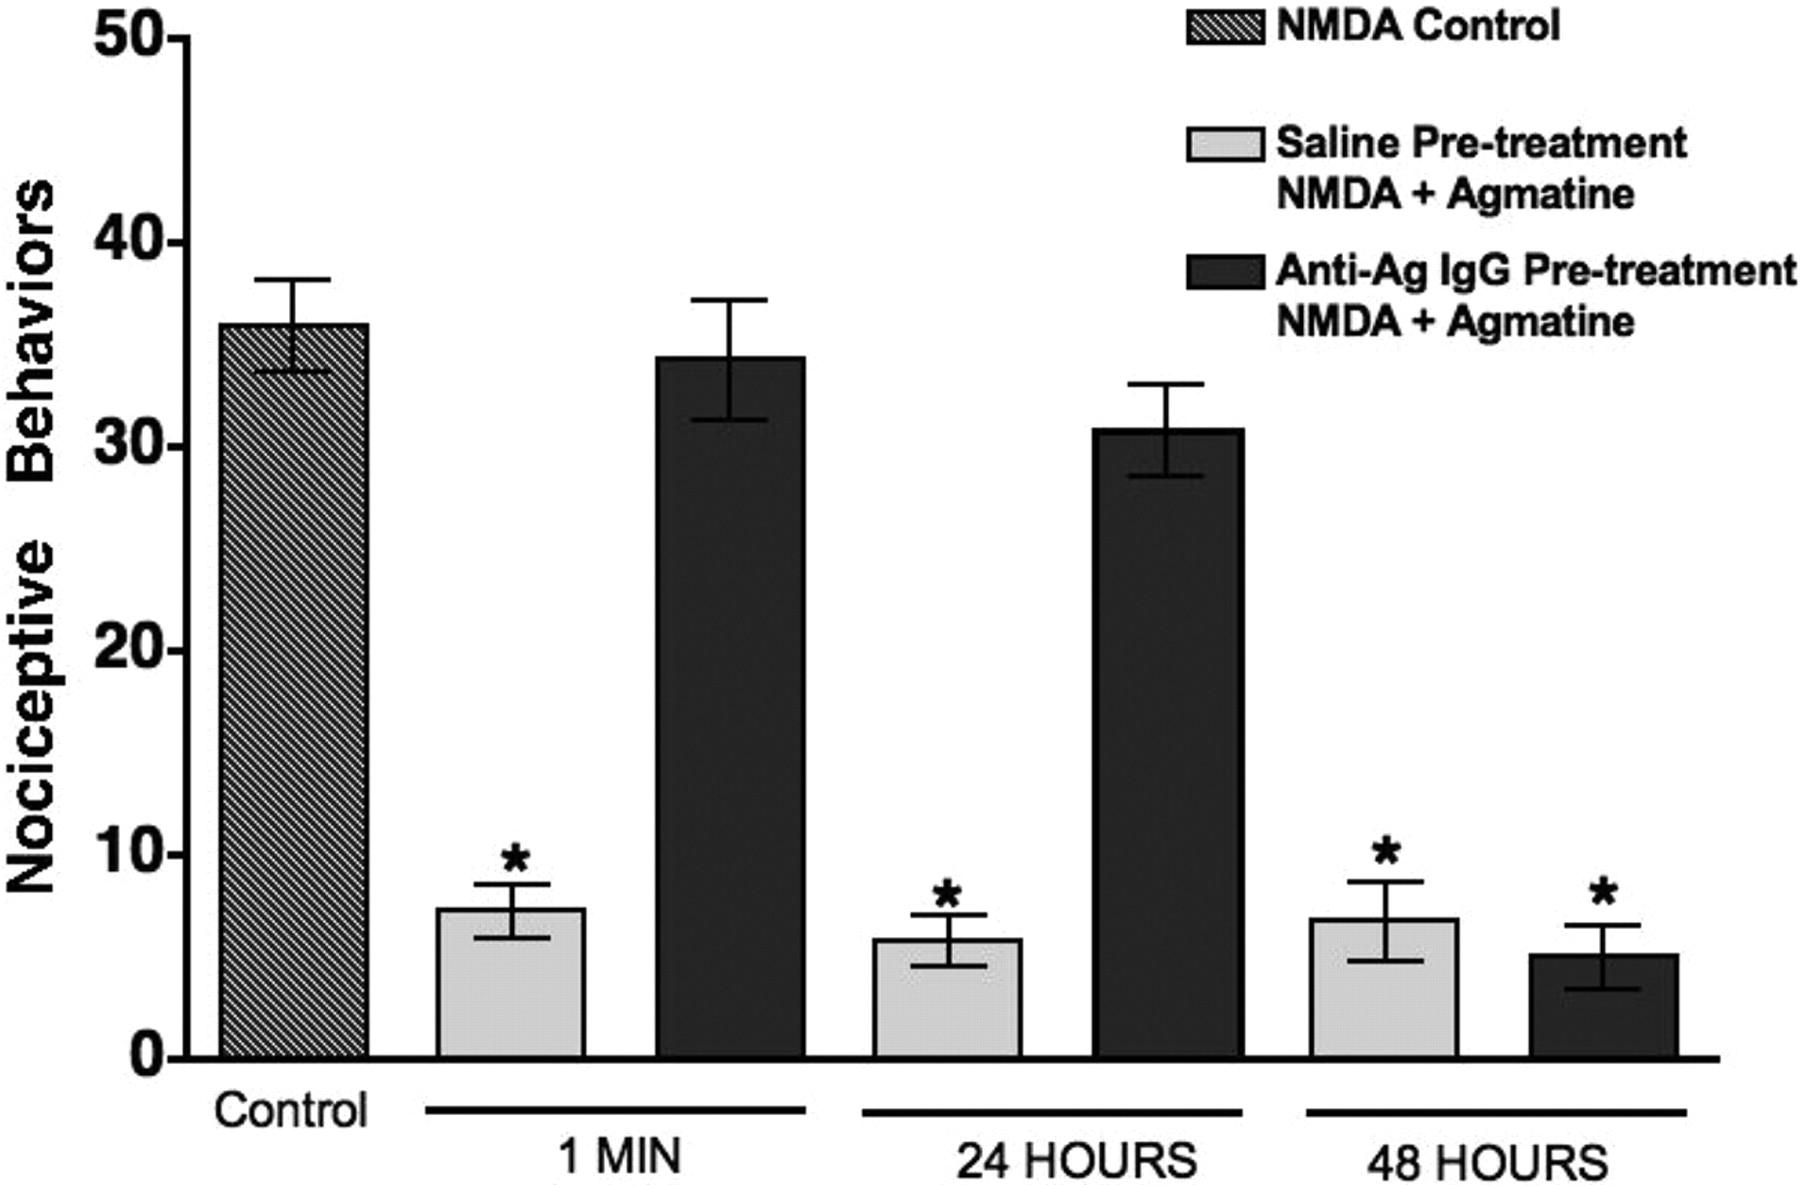 Immunoneutralization of Agmatine Sensitizes Mice to μ-Opioid